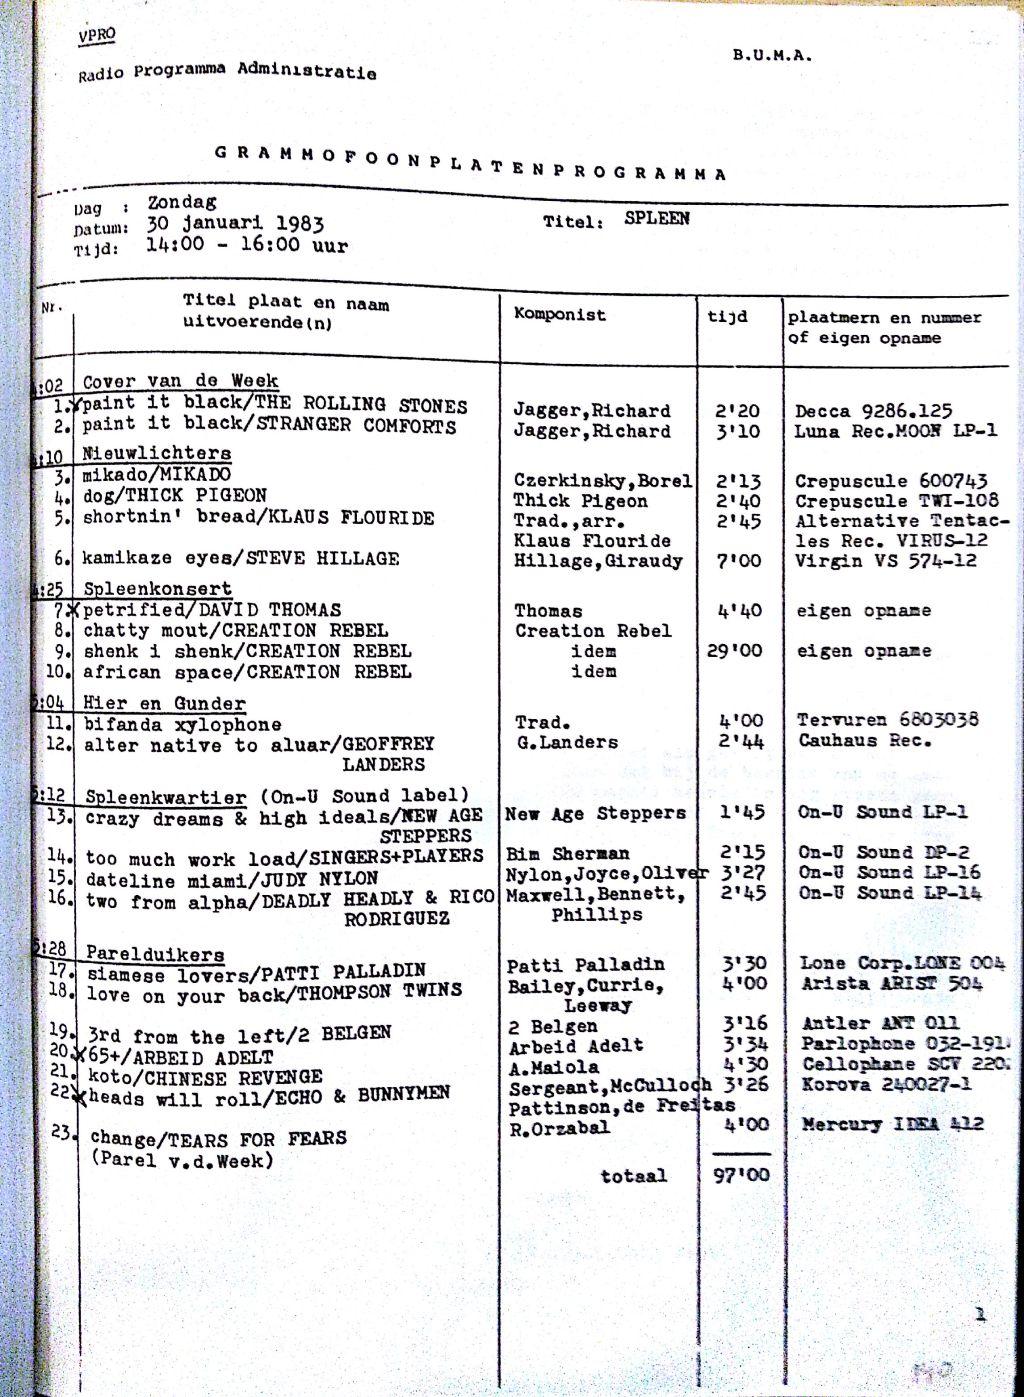 spleen 30 Januari 1983